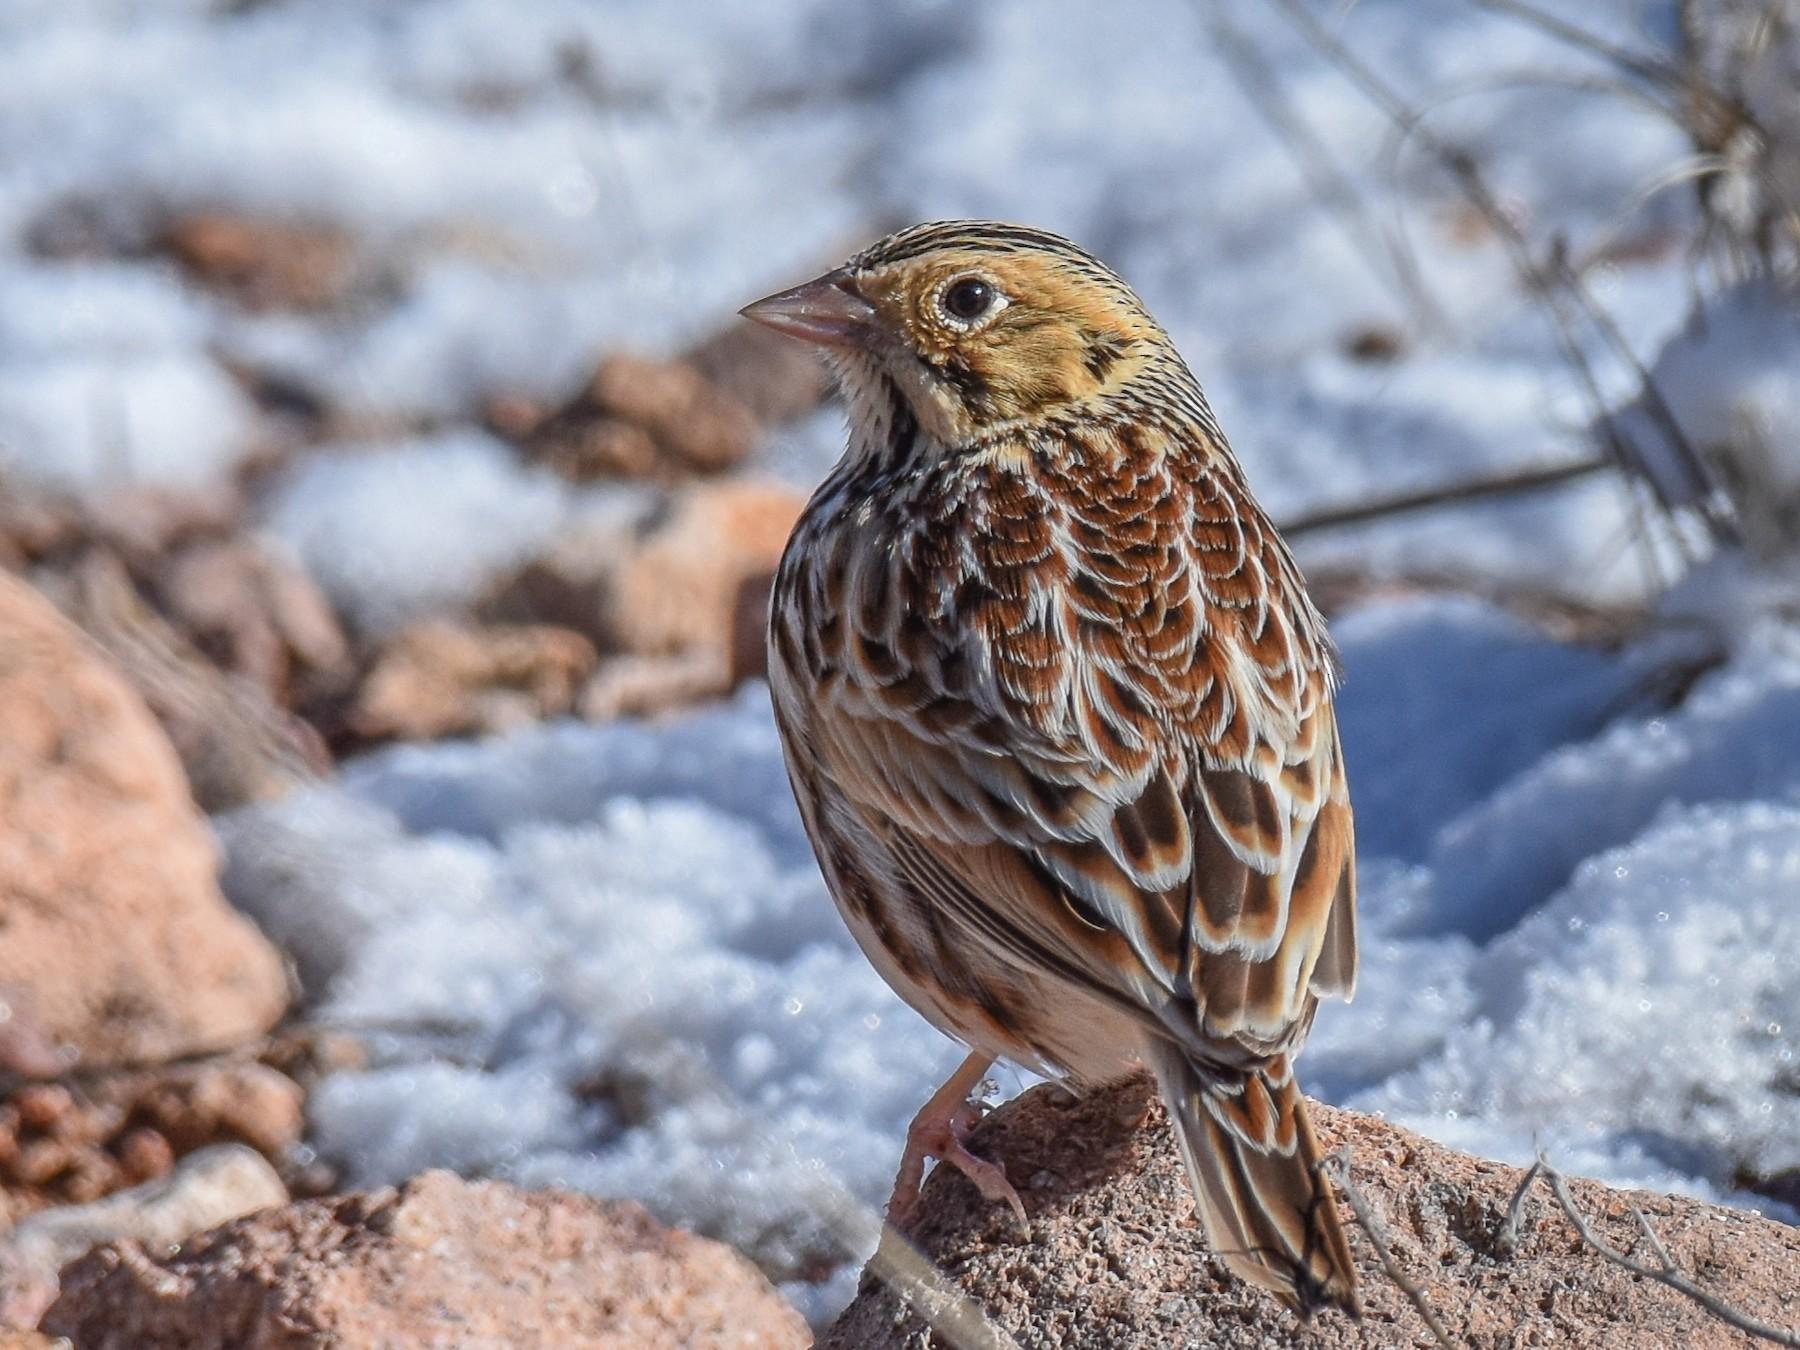 Baird's Sparrow - Jack Parlapiano